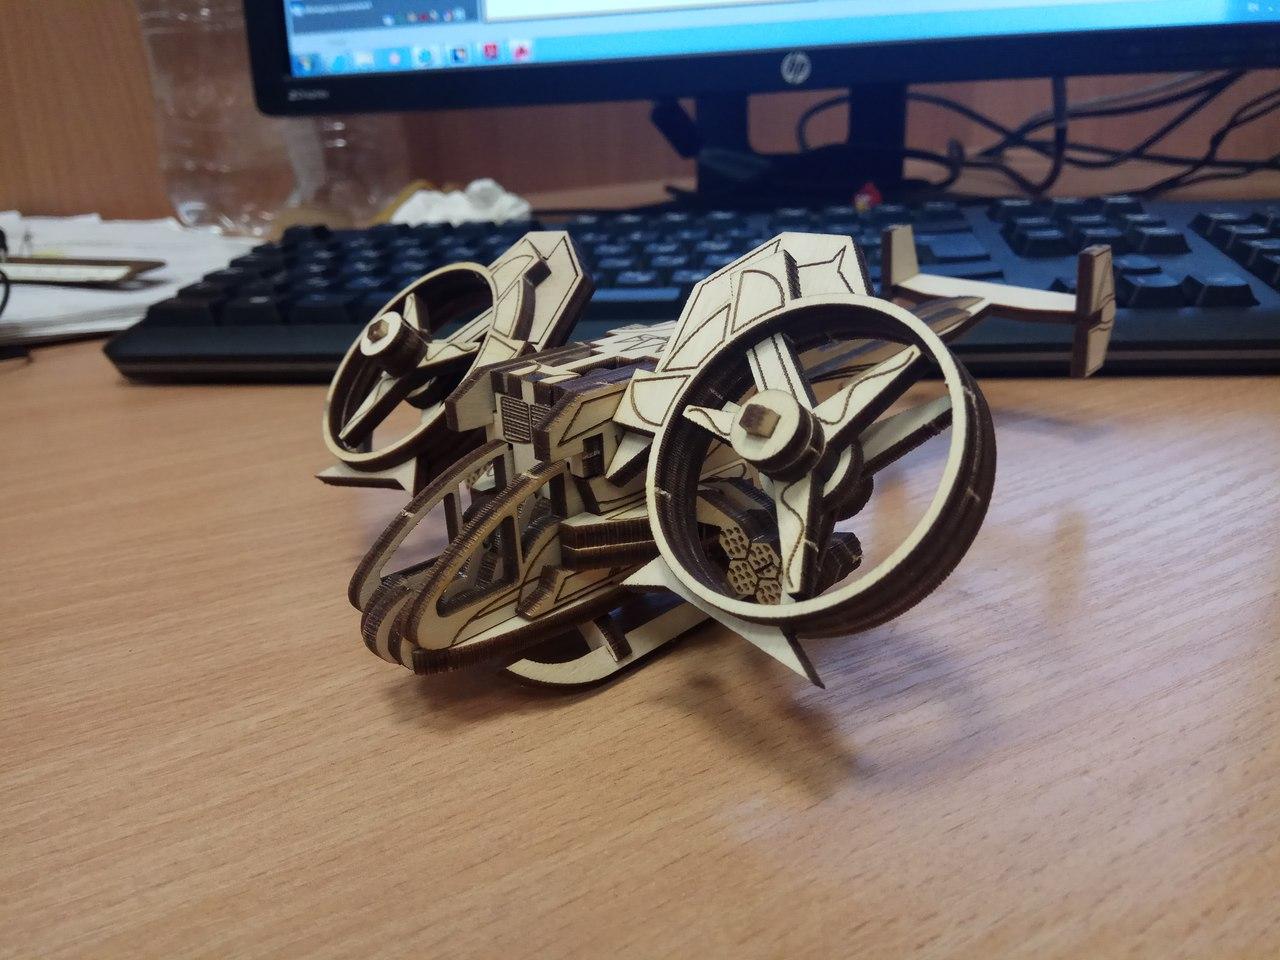 Laser Cut AT-99 Scorpion Gunship Free Vector